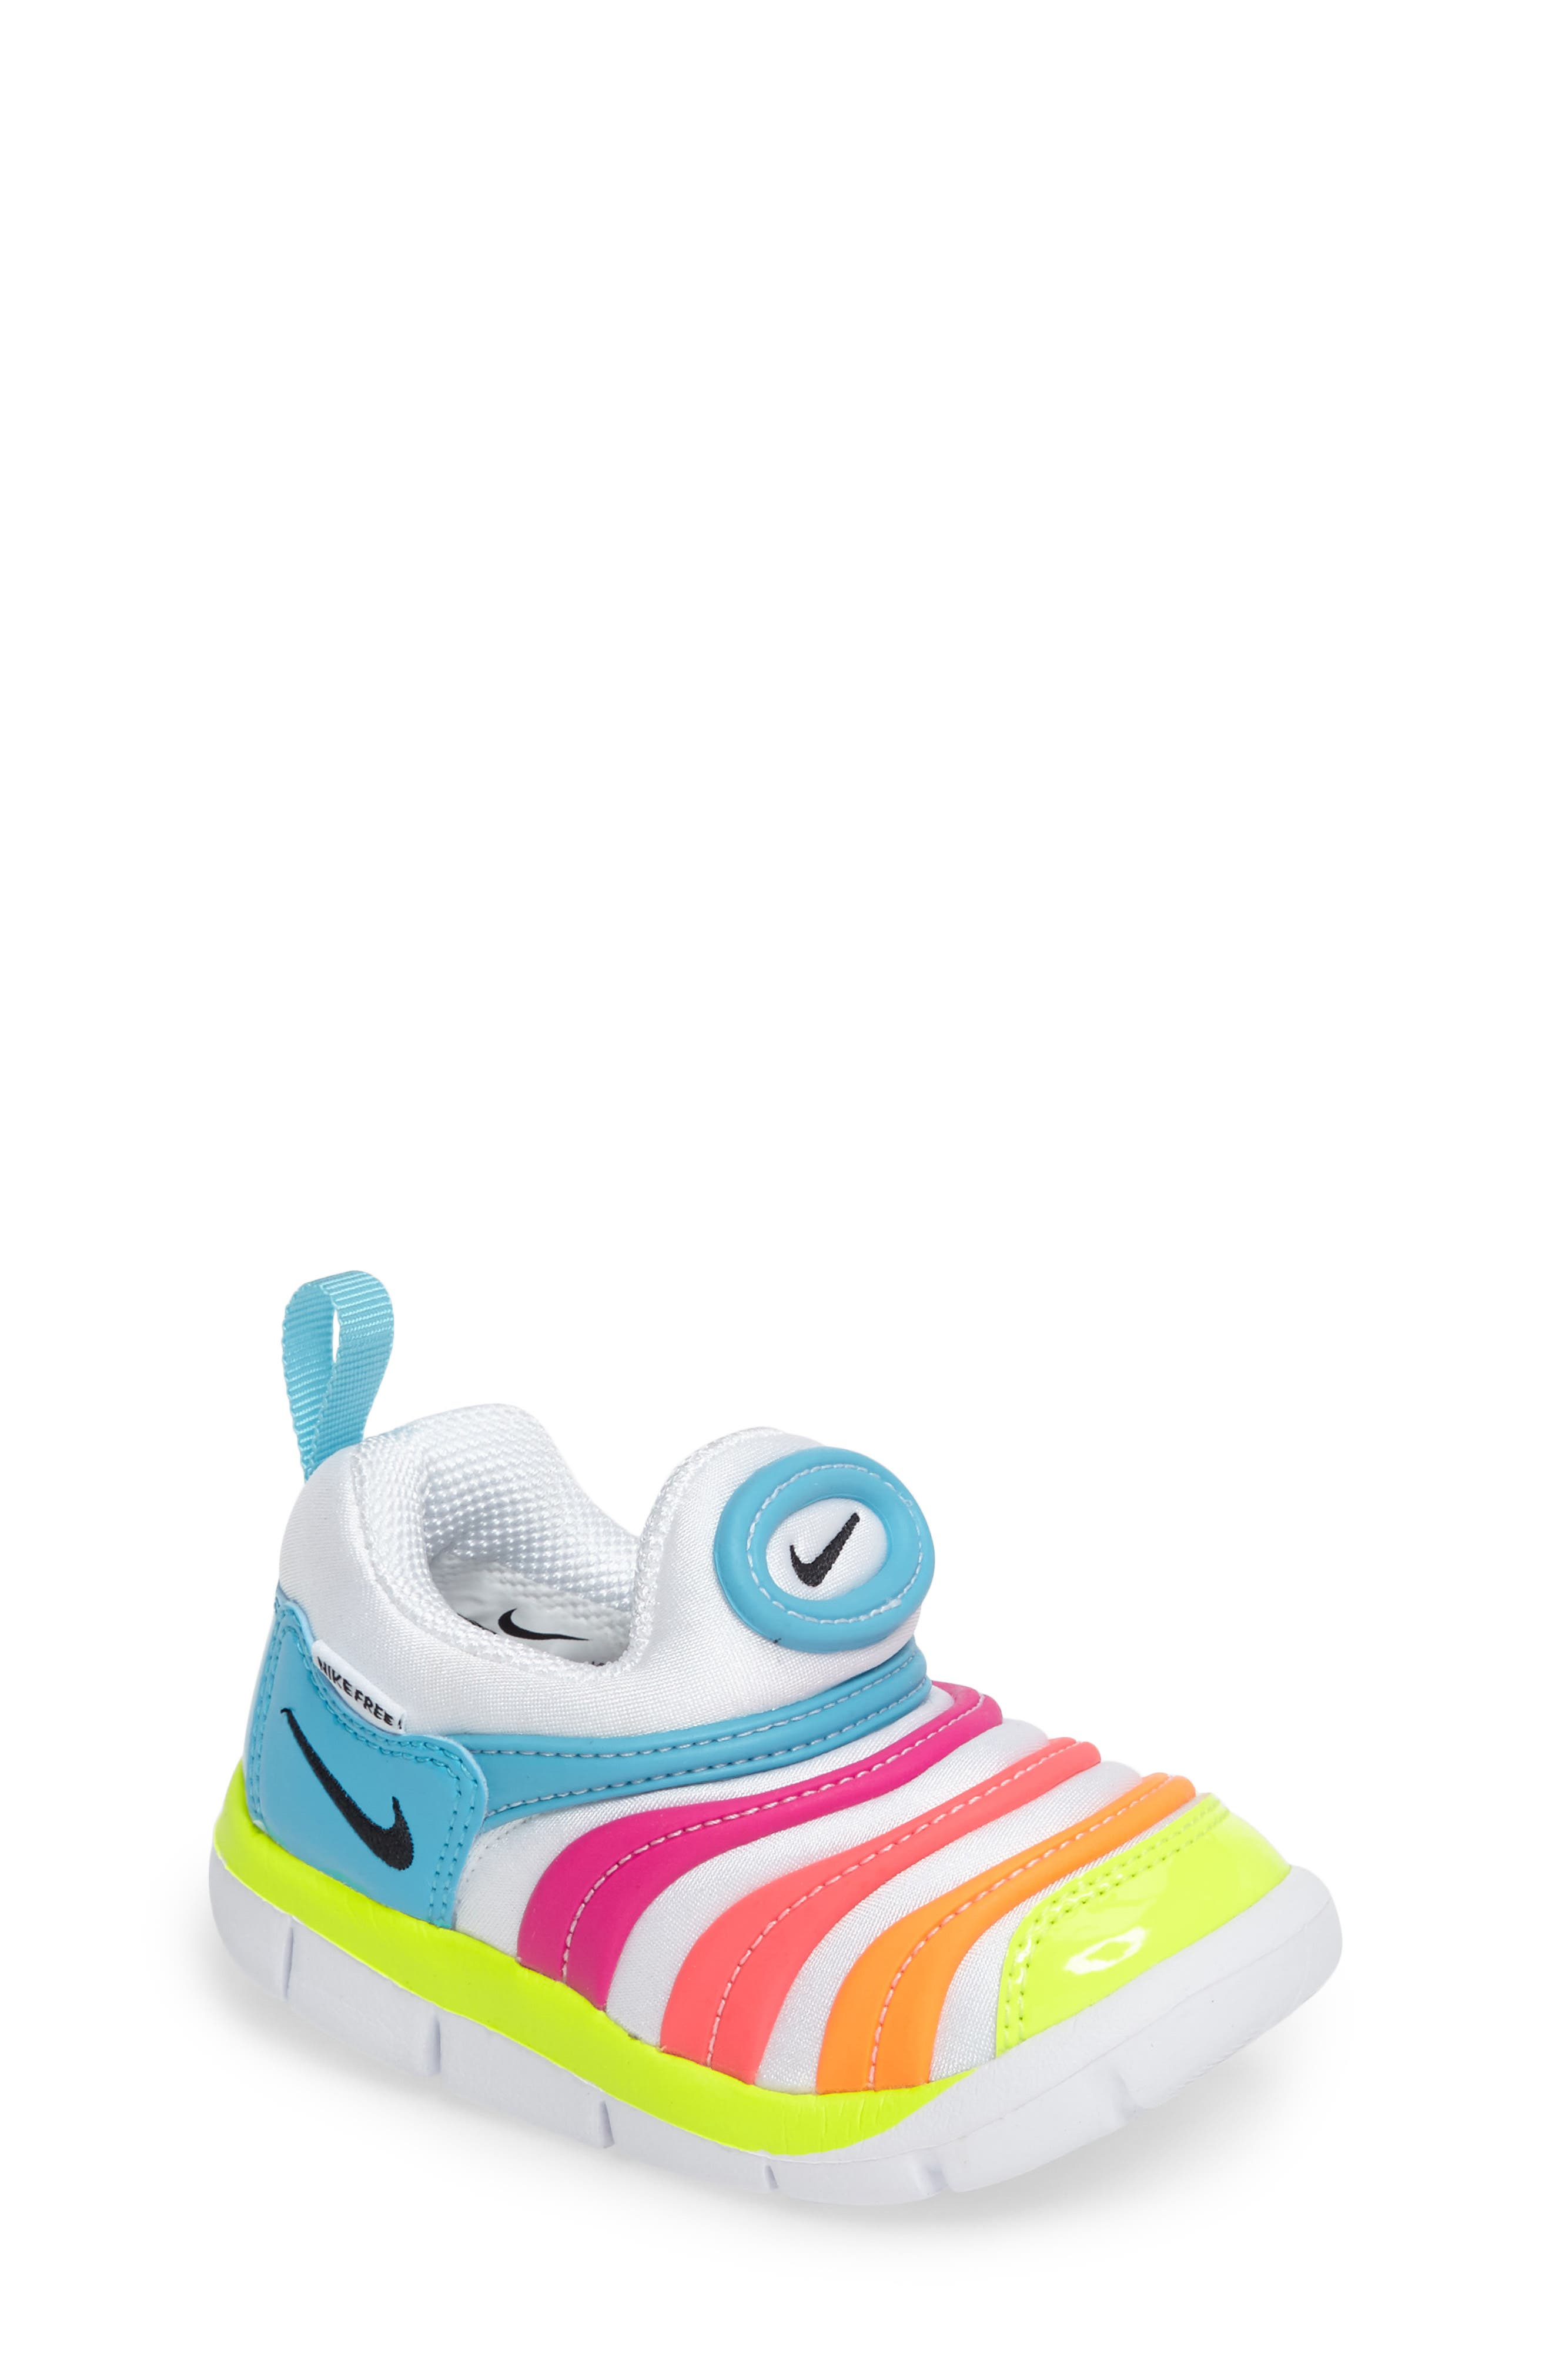 Main Image - Nike Dynamo Free Sneaker (Baby, Walker, & Toddler)